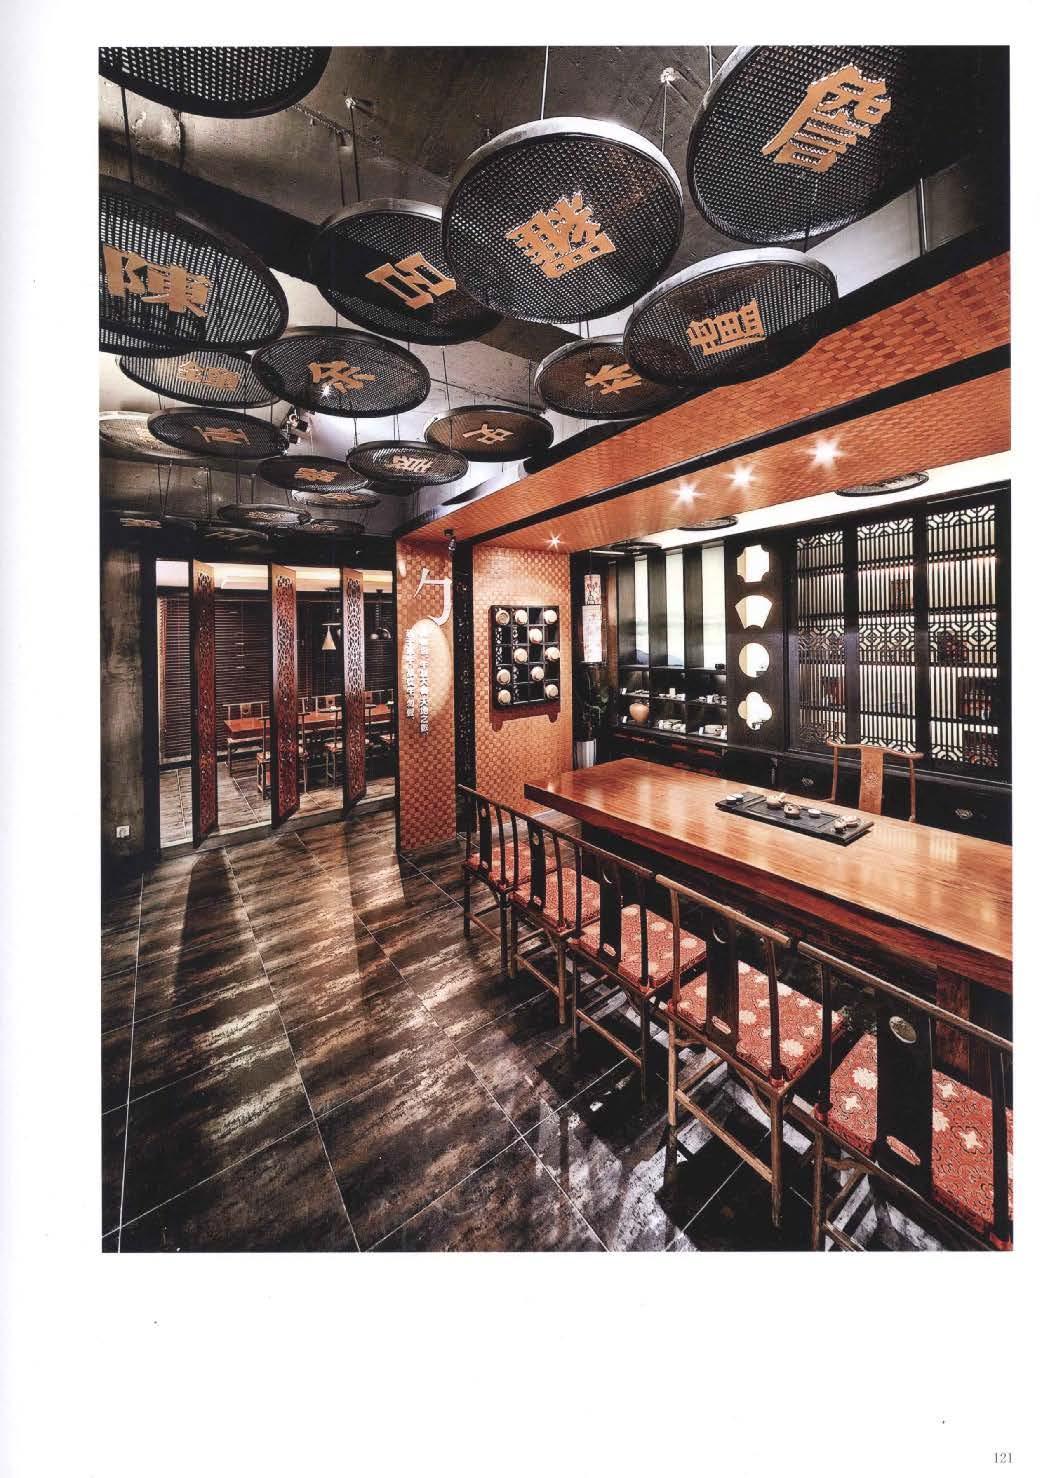 H073 东方风情 会所、餐饮细部解析_Page_119.jpg